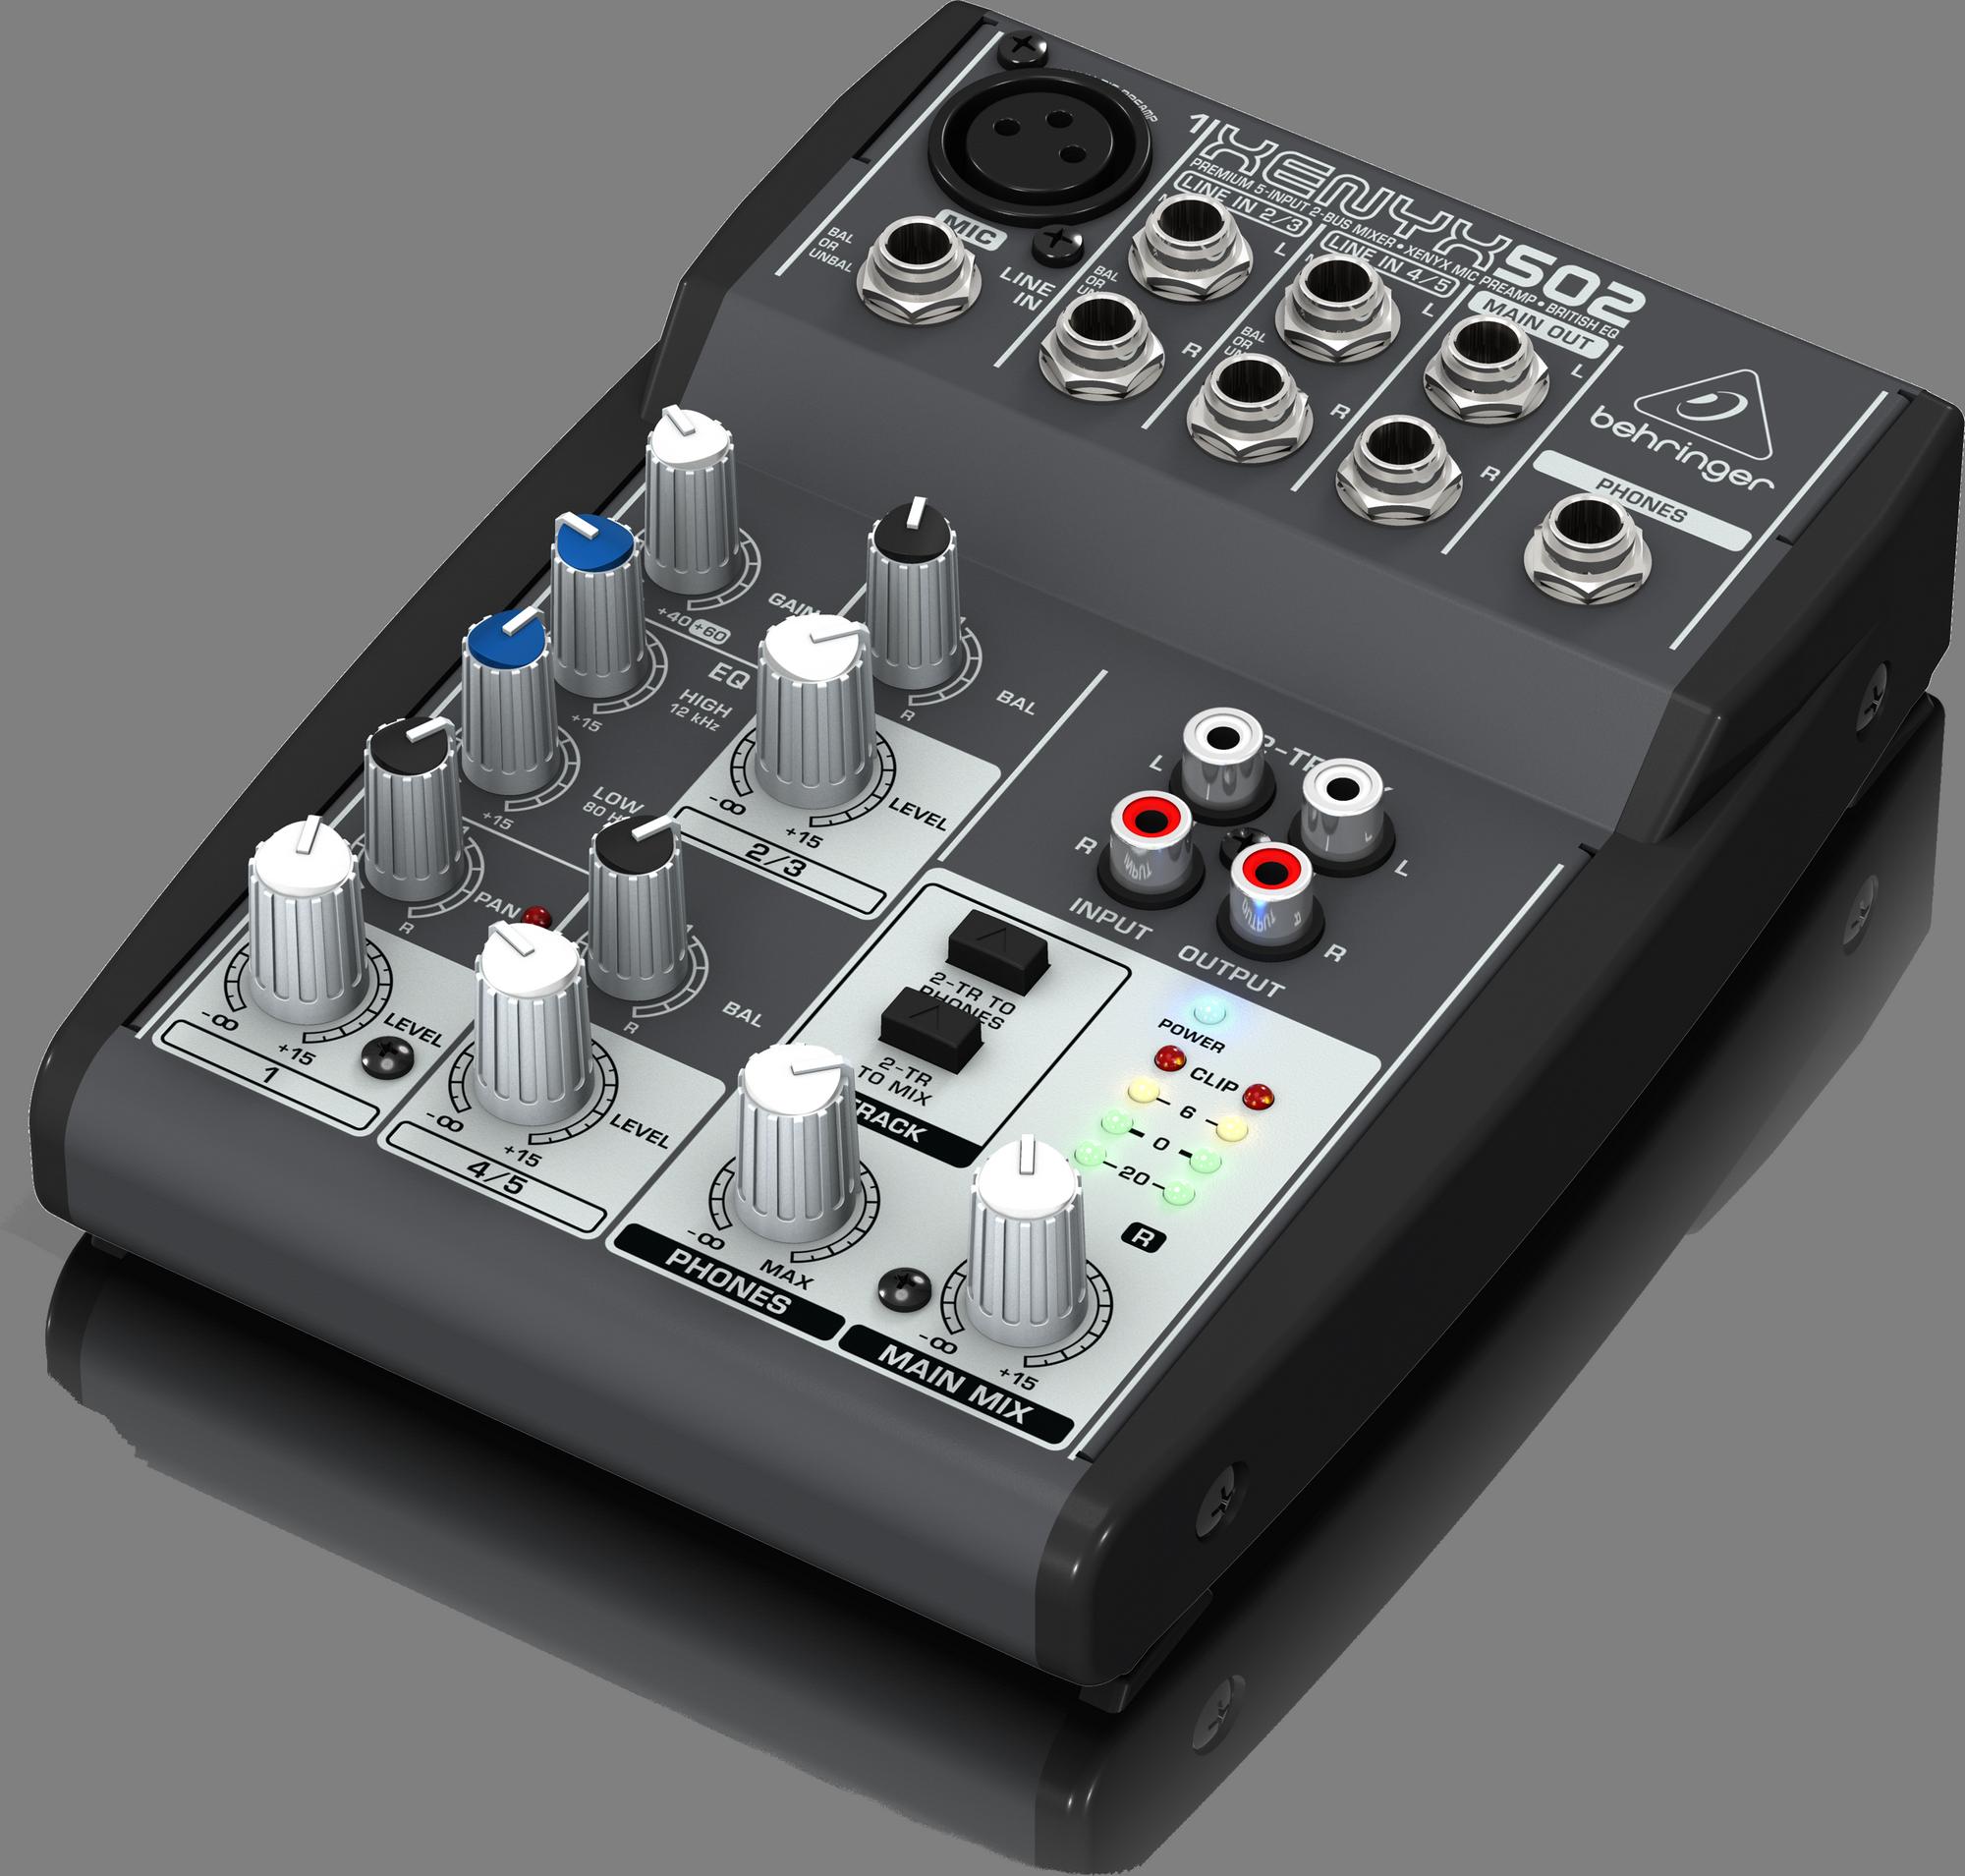 Behringer XENYX 502 - Analog mixer